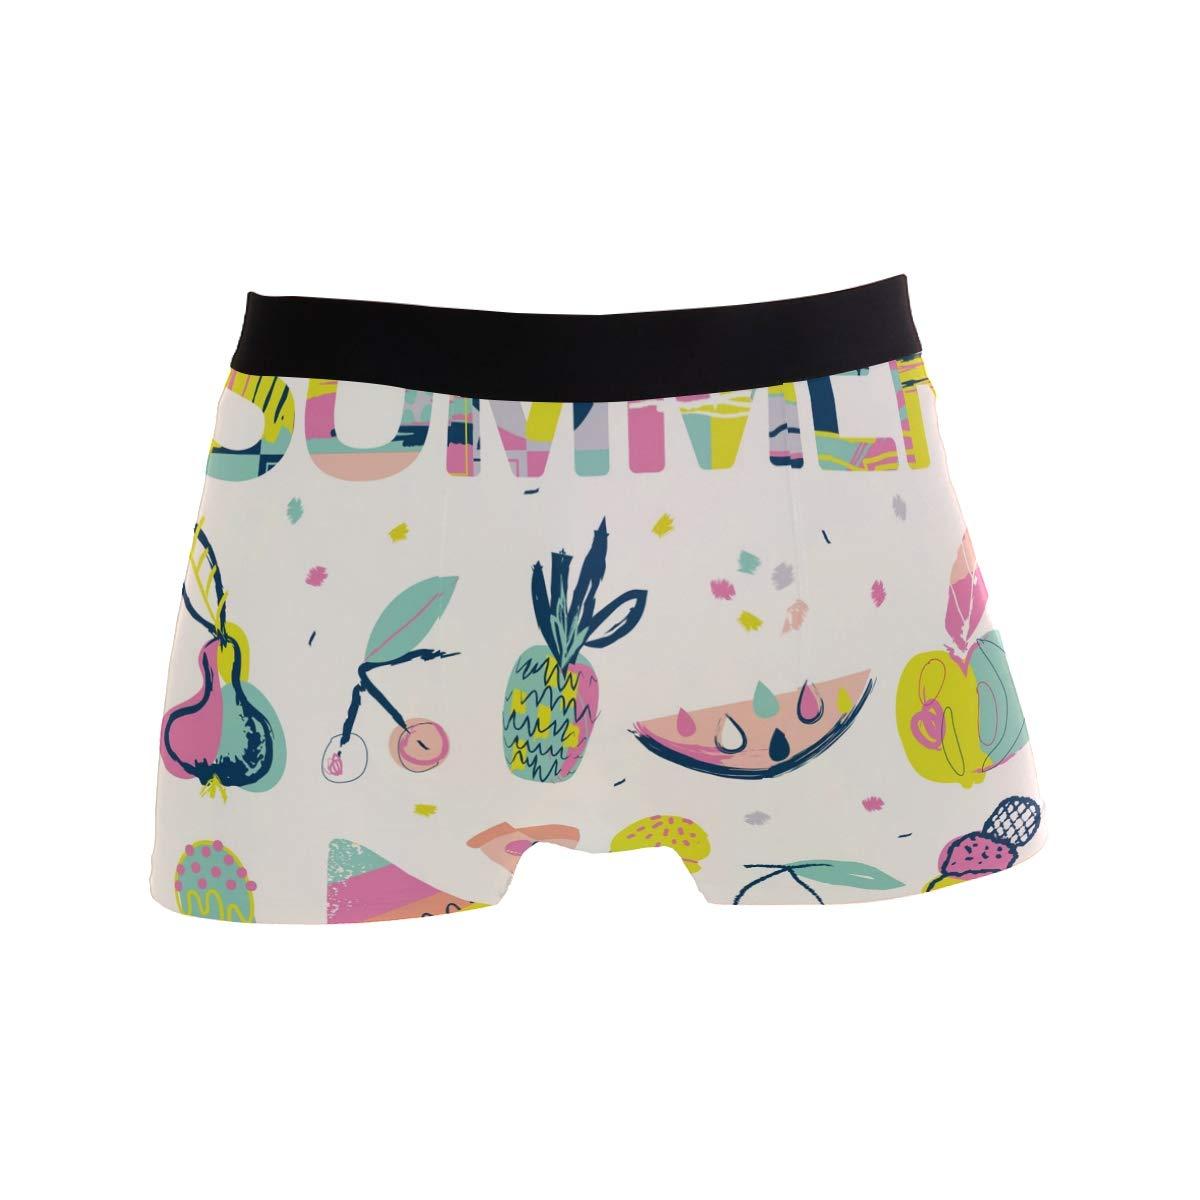 Mkuell Dinosaur Comfortable Mens Boxer Briefs Multi-Size Soft Underwear S